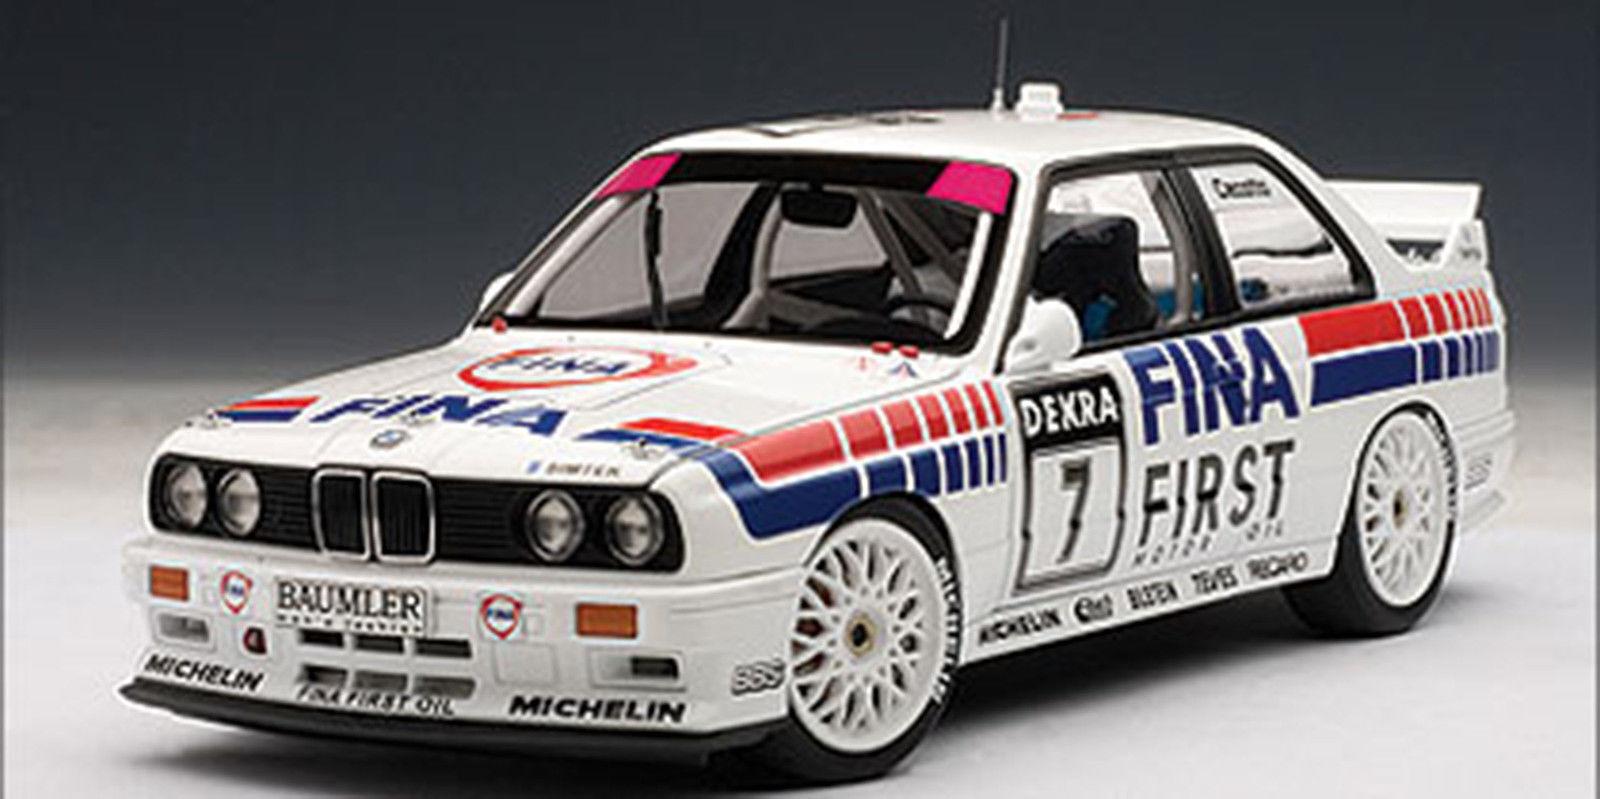 AUTOART 1992 BMW M3 DTM  FINA  CECOTTO  7 1 18New ReleaseSuper Hot